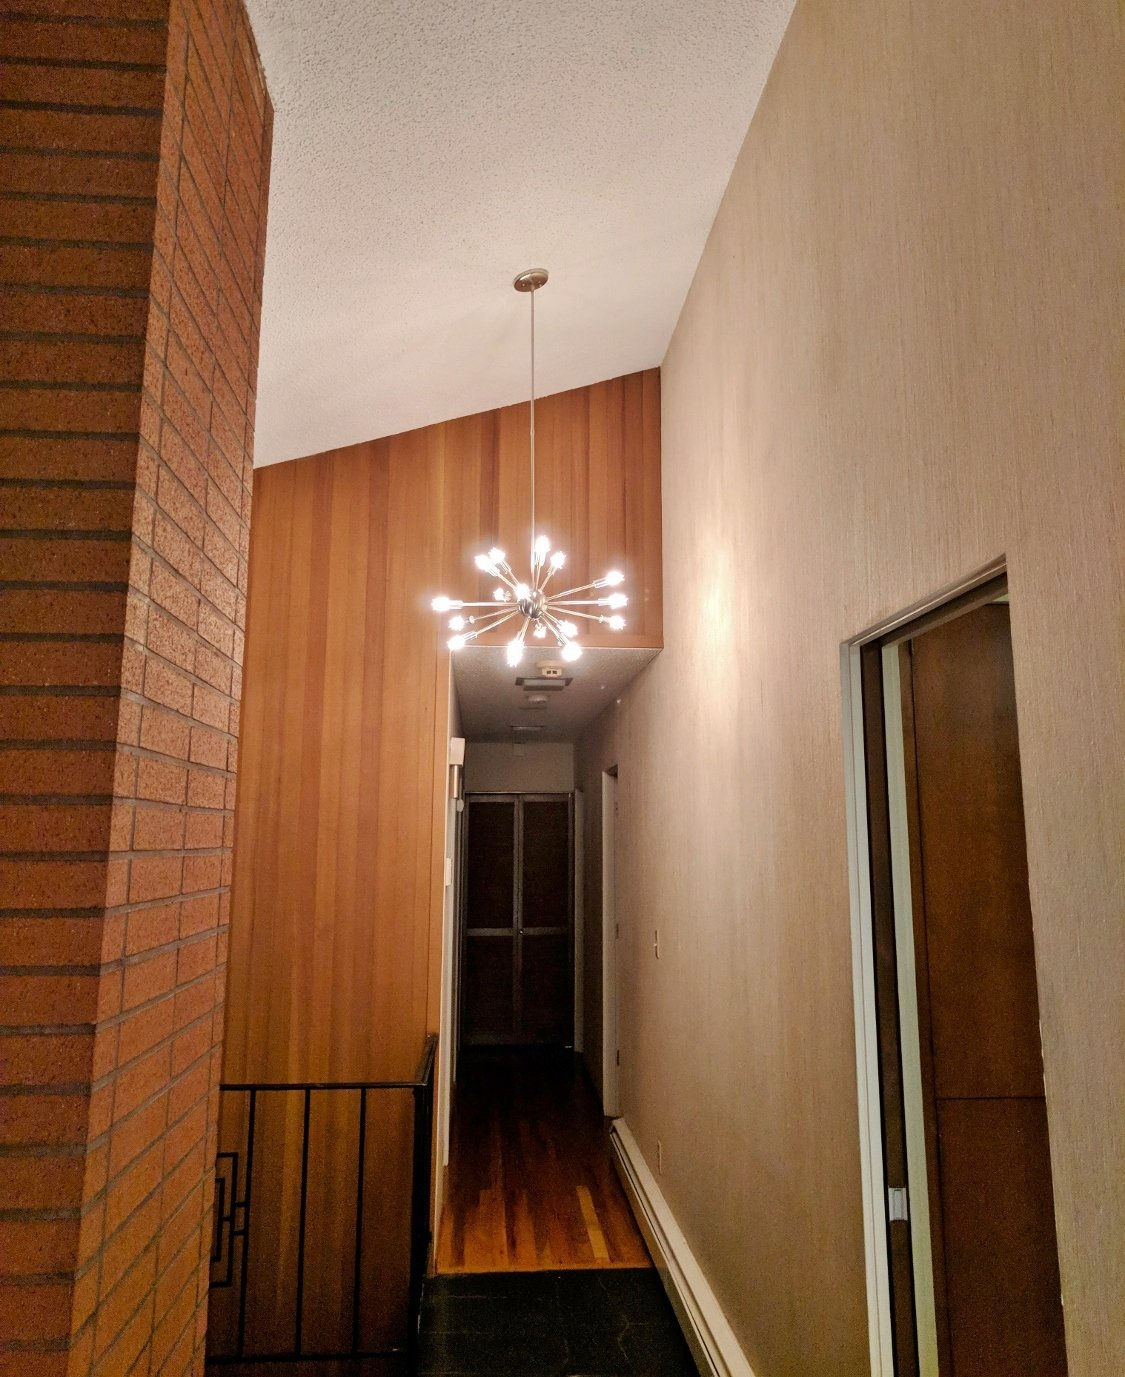 Sputnik light in midcentury modern home